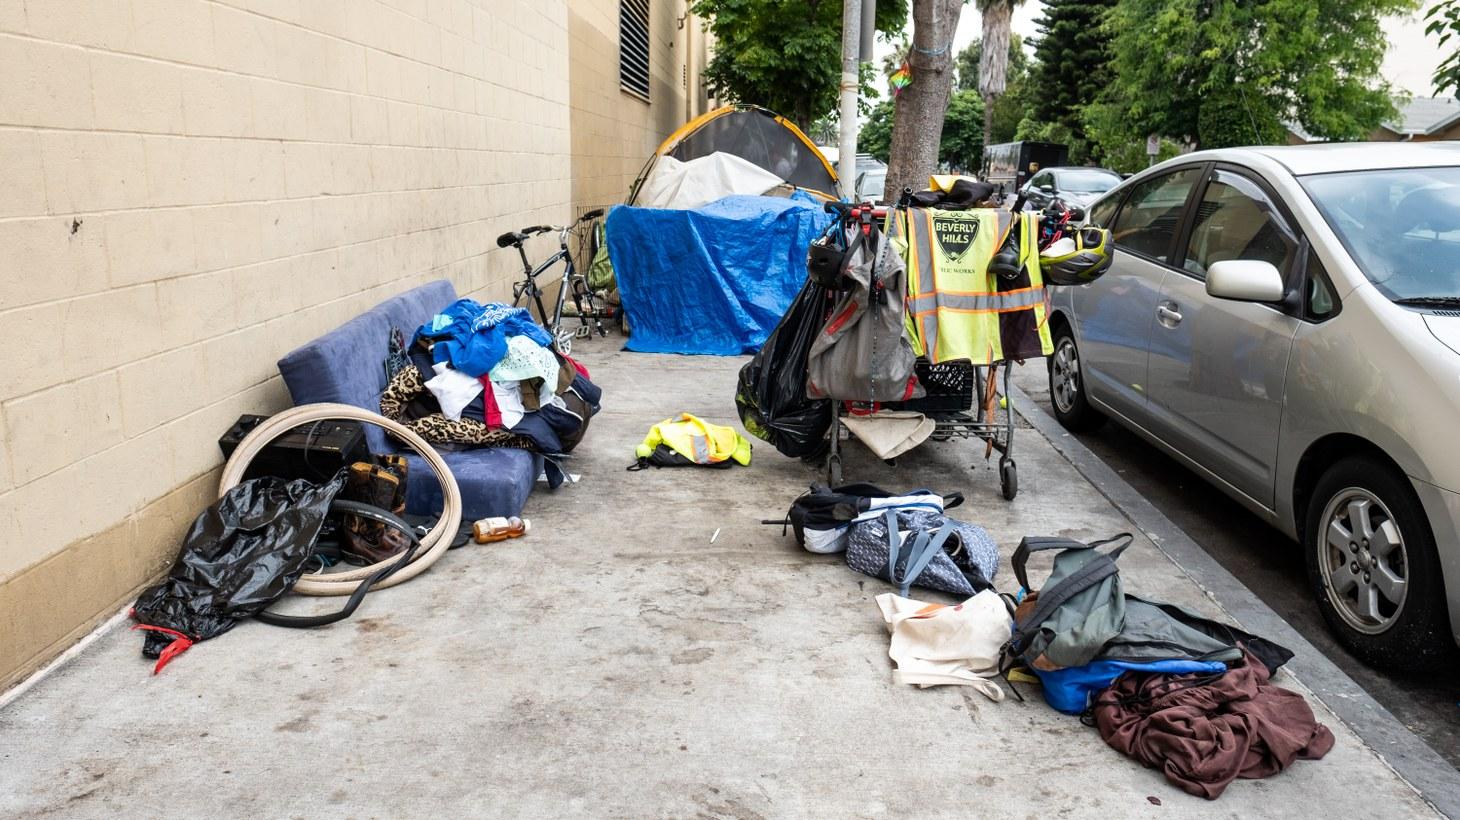 A homeless camp in Culver City, June 6, 2019.